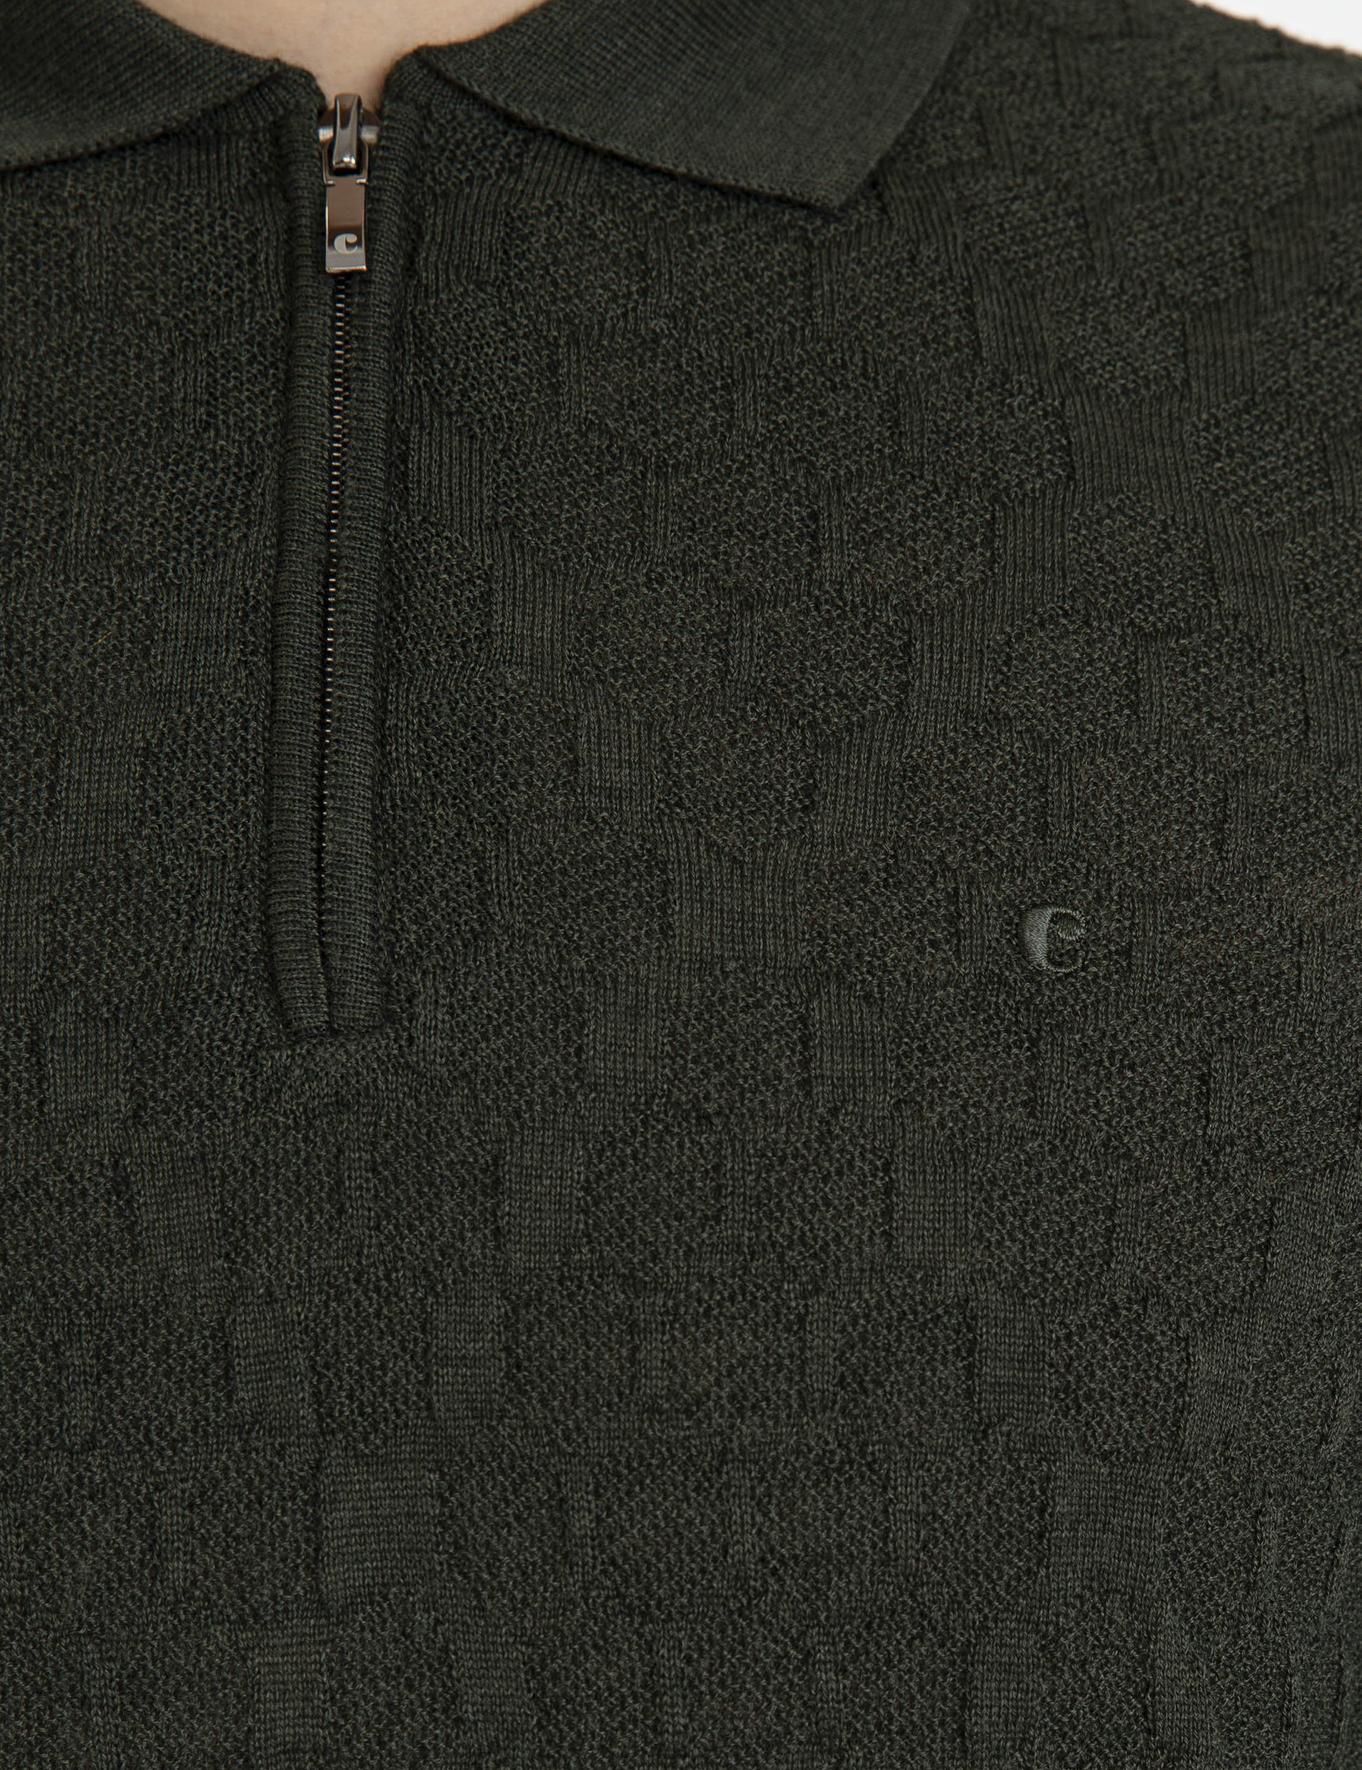 Polo Yaka Kazak - 50230066016